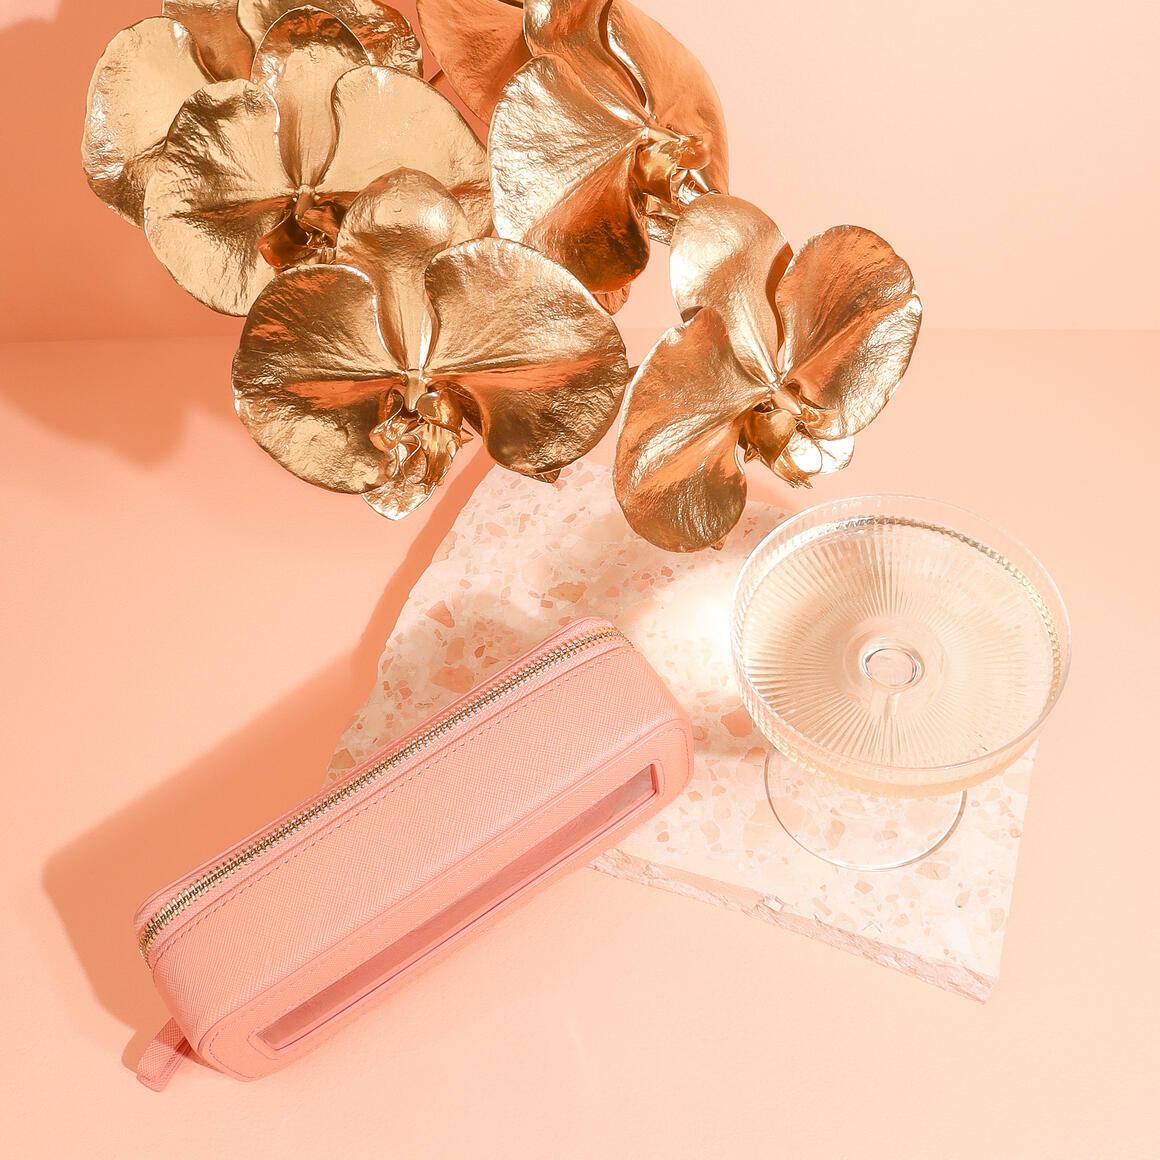 Peach Cosmetic Bag - Small | Trada Marketplace